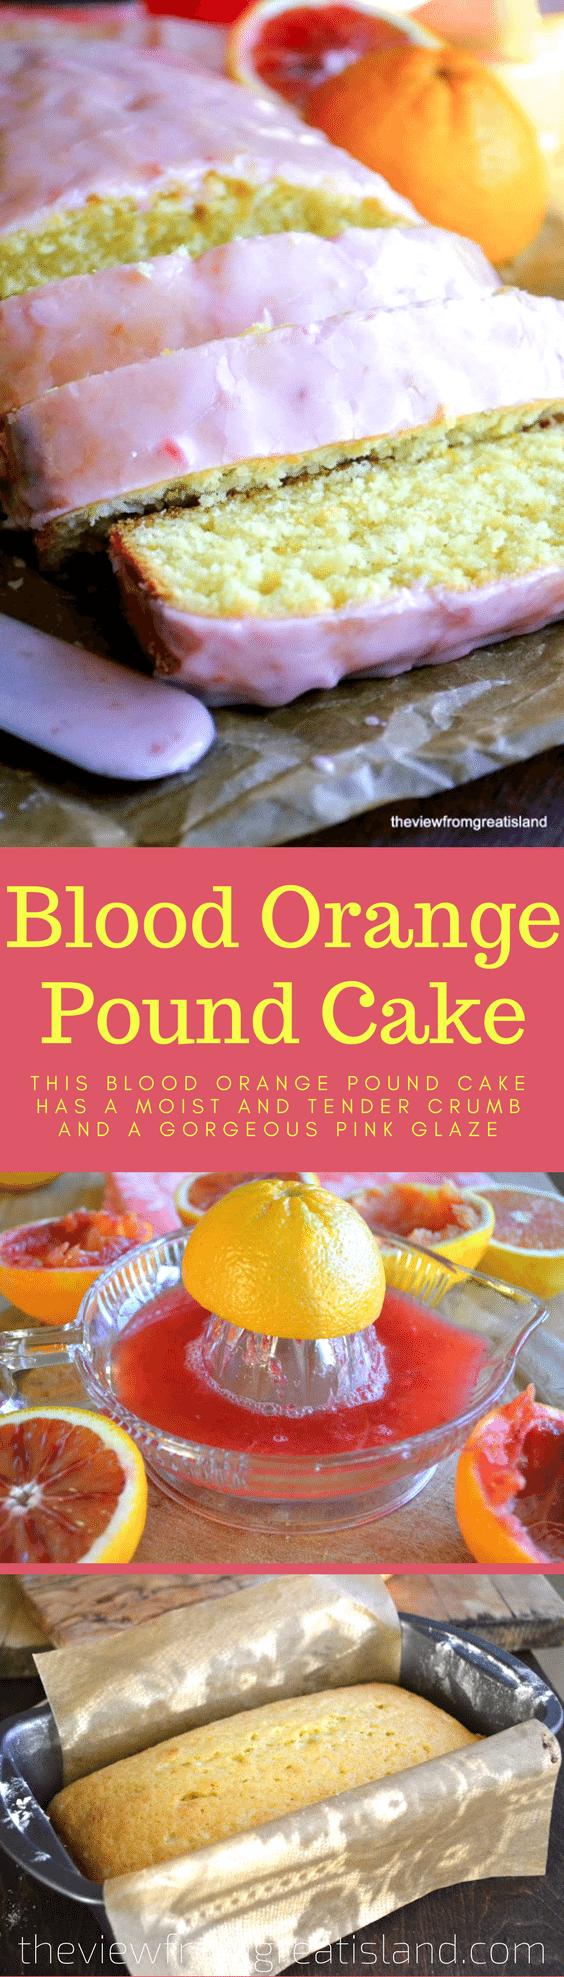 This Blood Orange Pound Cake has a moist and tender crumb and a gorgeous pink glaze thanks to some fresh squeezed blood orange juice! #cake #poundcake #orangecake #bloodoranges #coffeecake #dessert #citrus #loafcake #bloodorangecake #breakfast #brunch